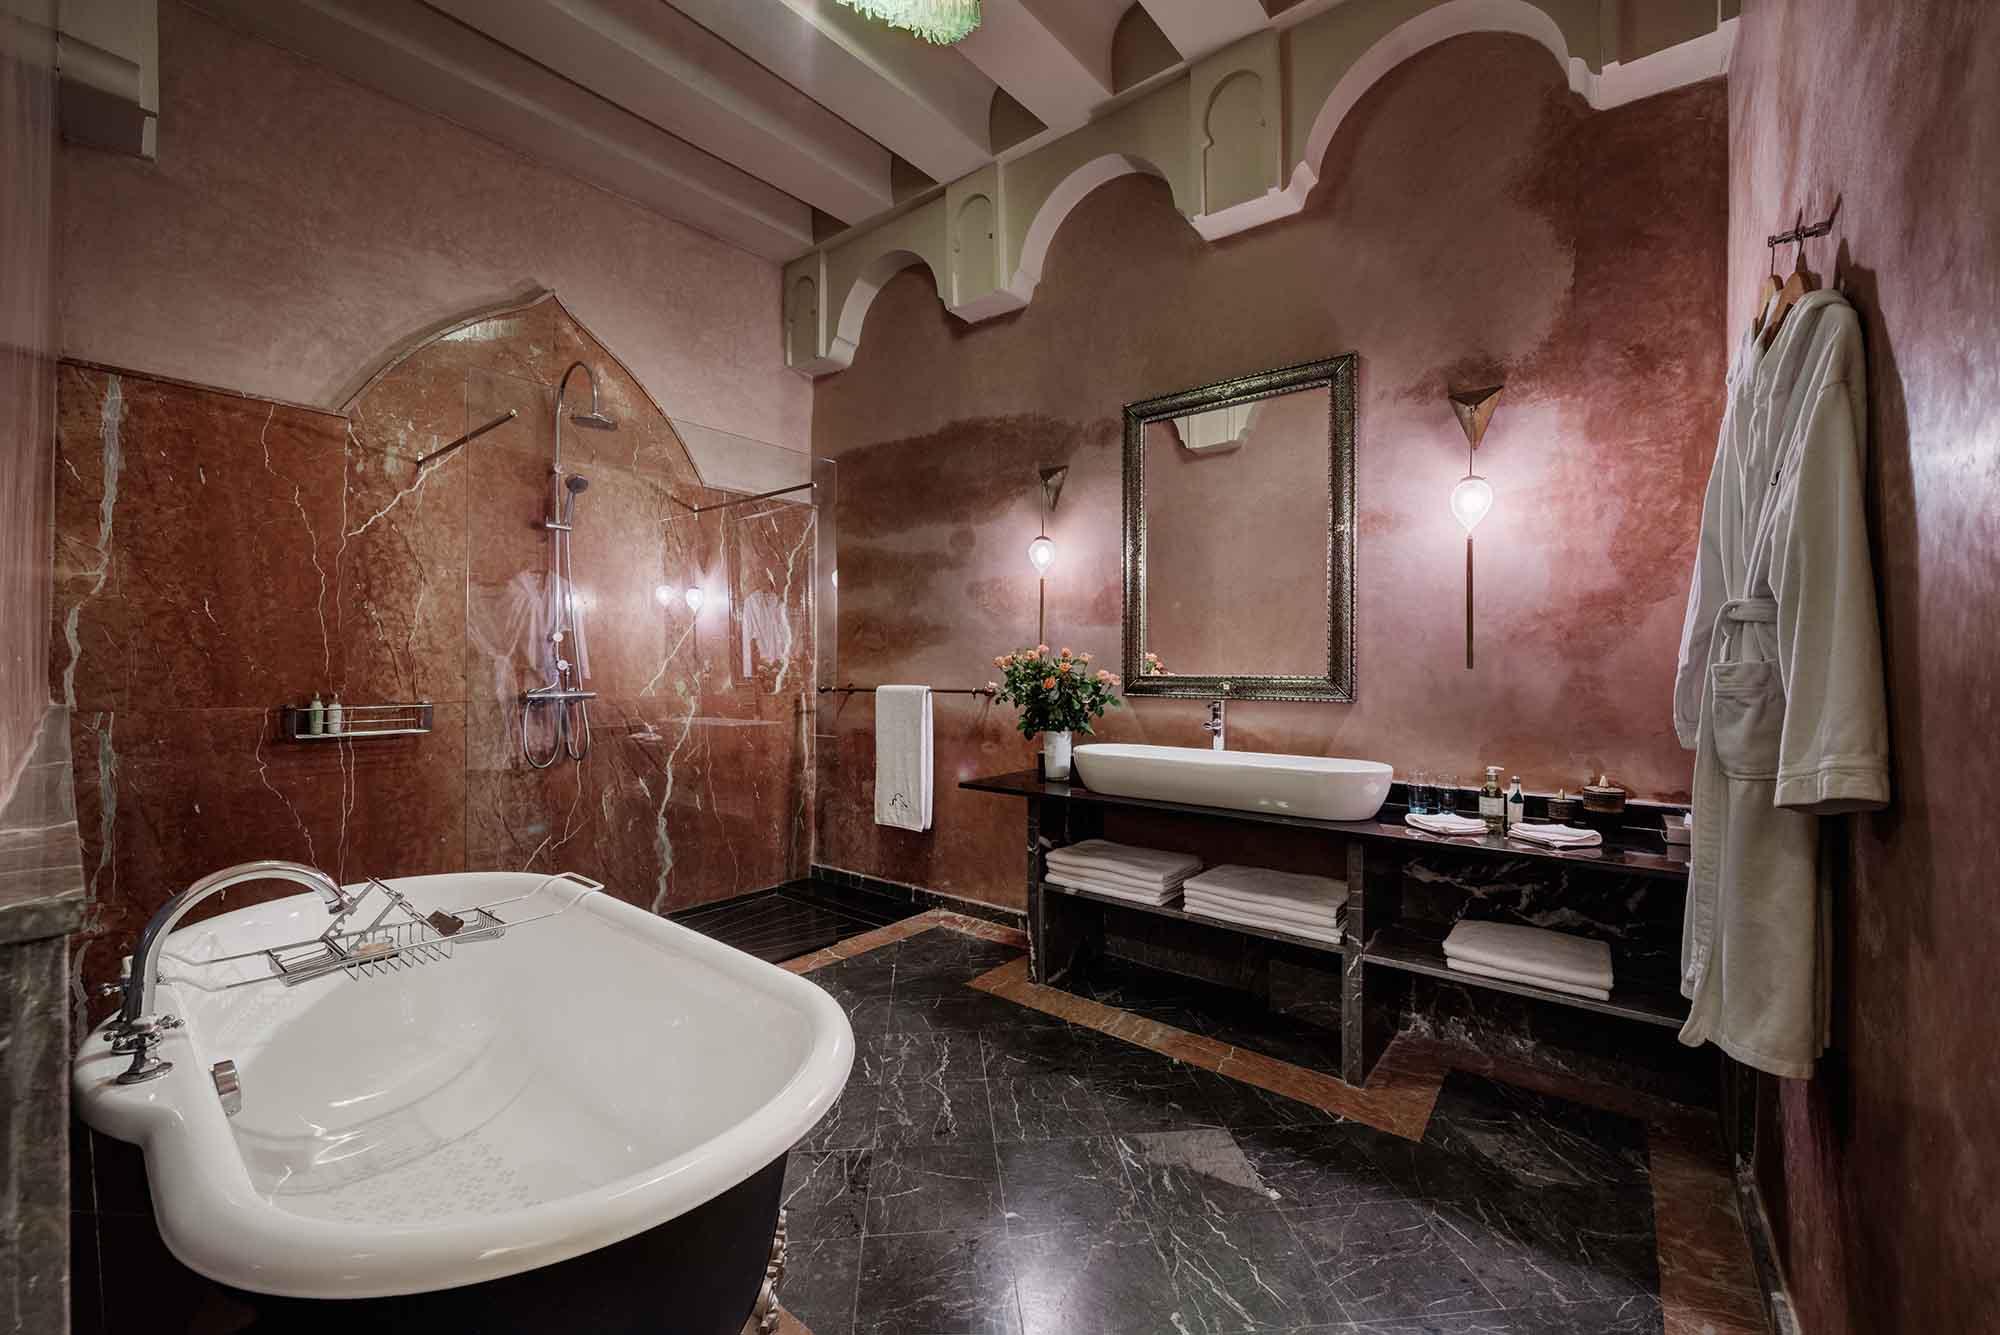 RIAD SIWAN GUEST HOUSE MARRAKECH BATHROOM